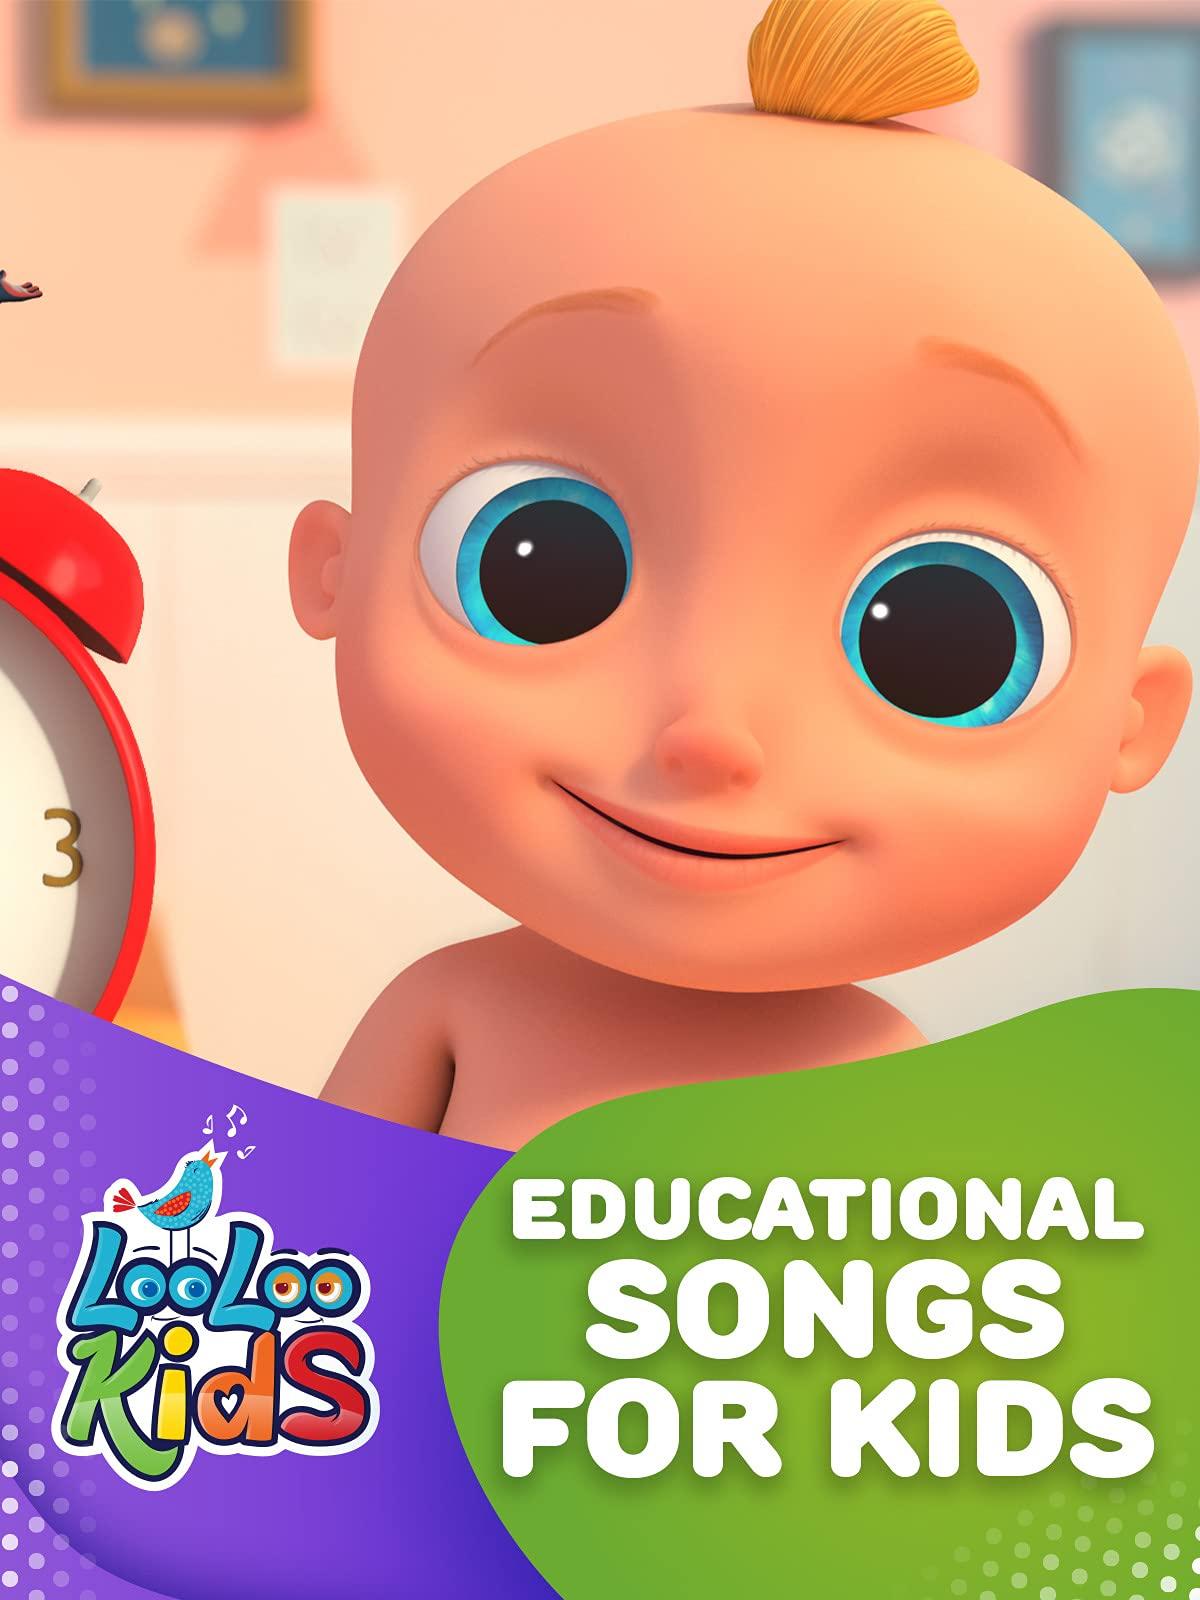 Educational Songs for Kids - LooLoo Kids on Amazon Prime Video UK